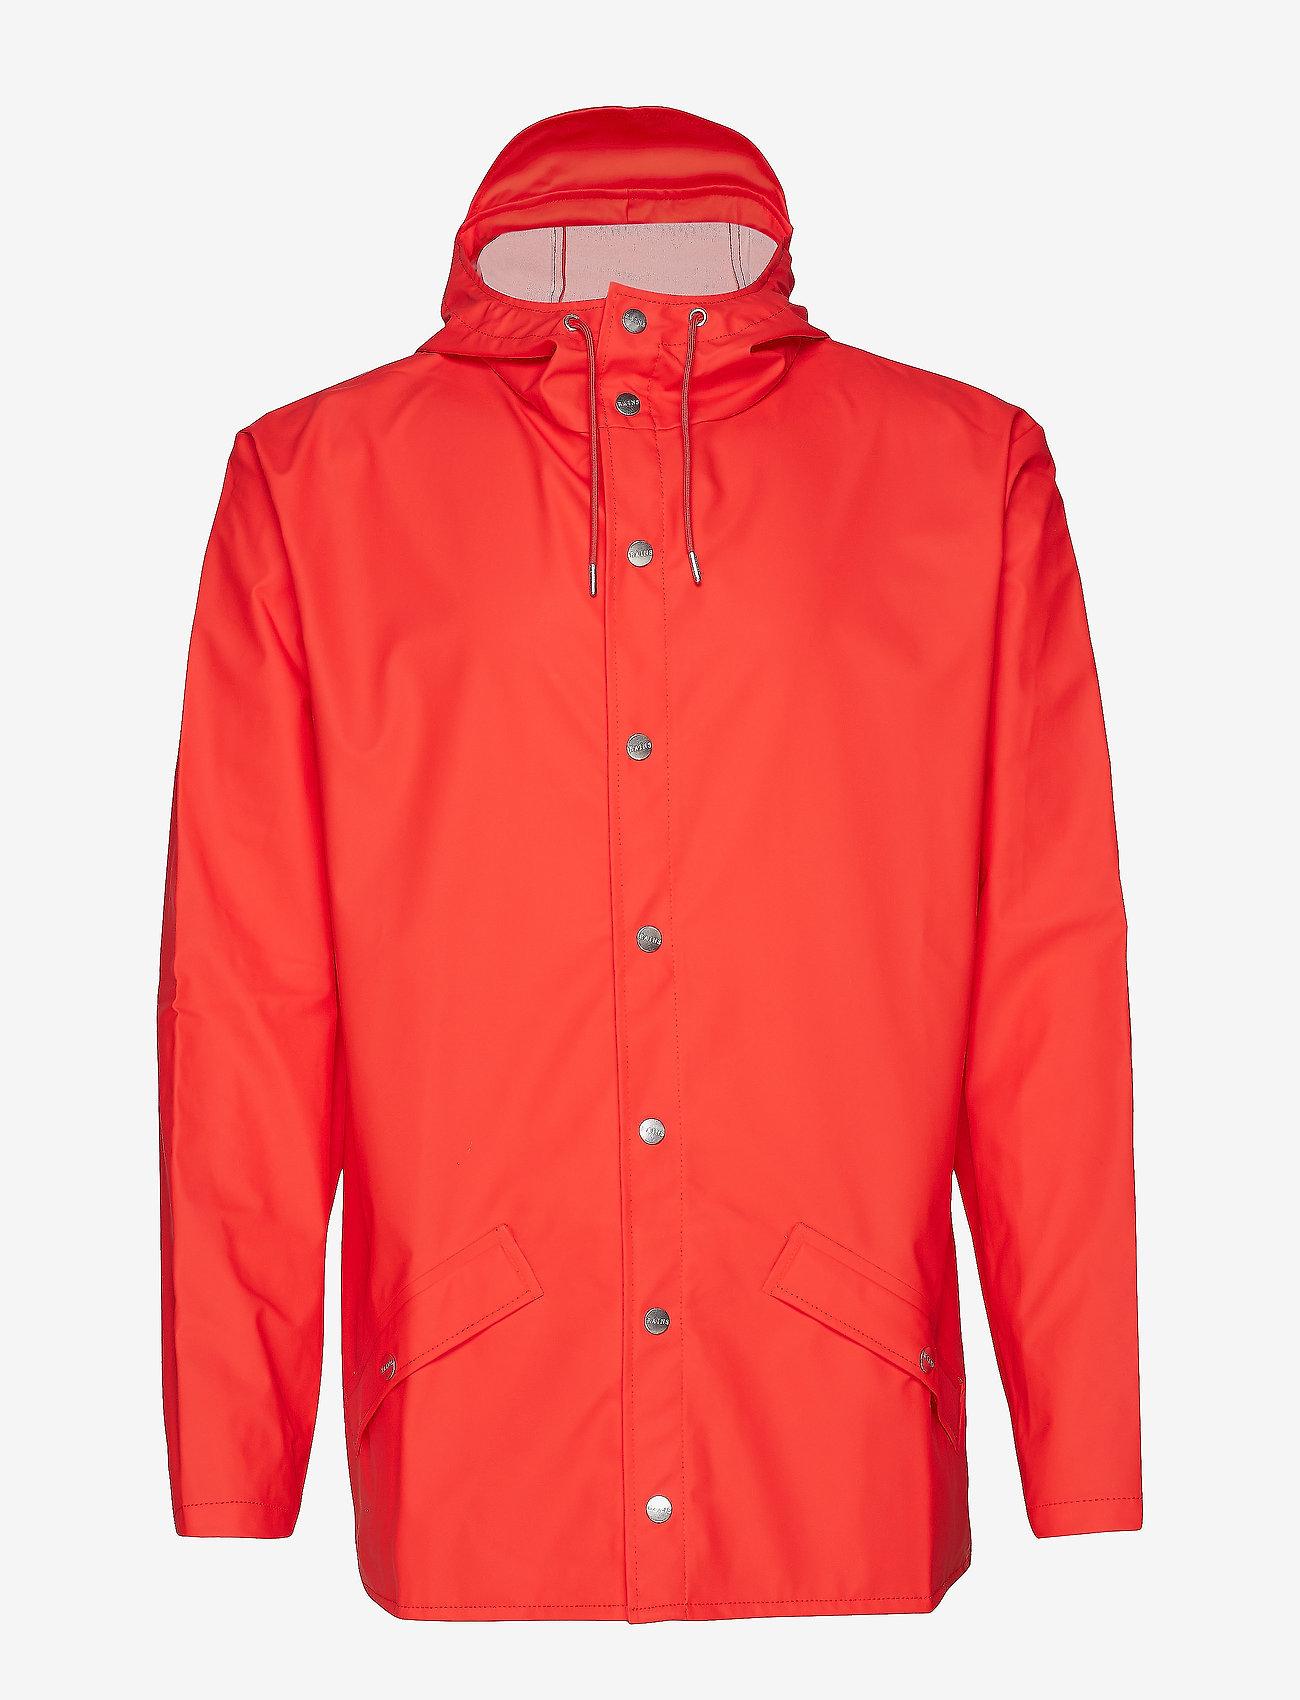 Rains - Jacket - regenbekleidung - red - 1